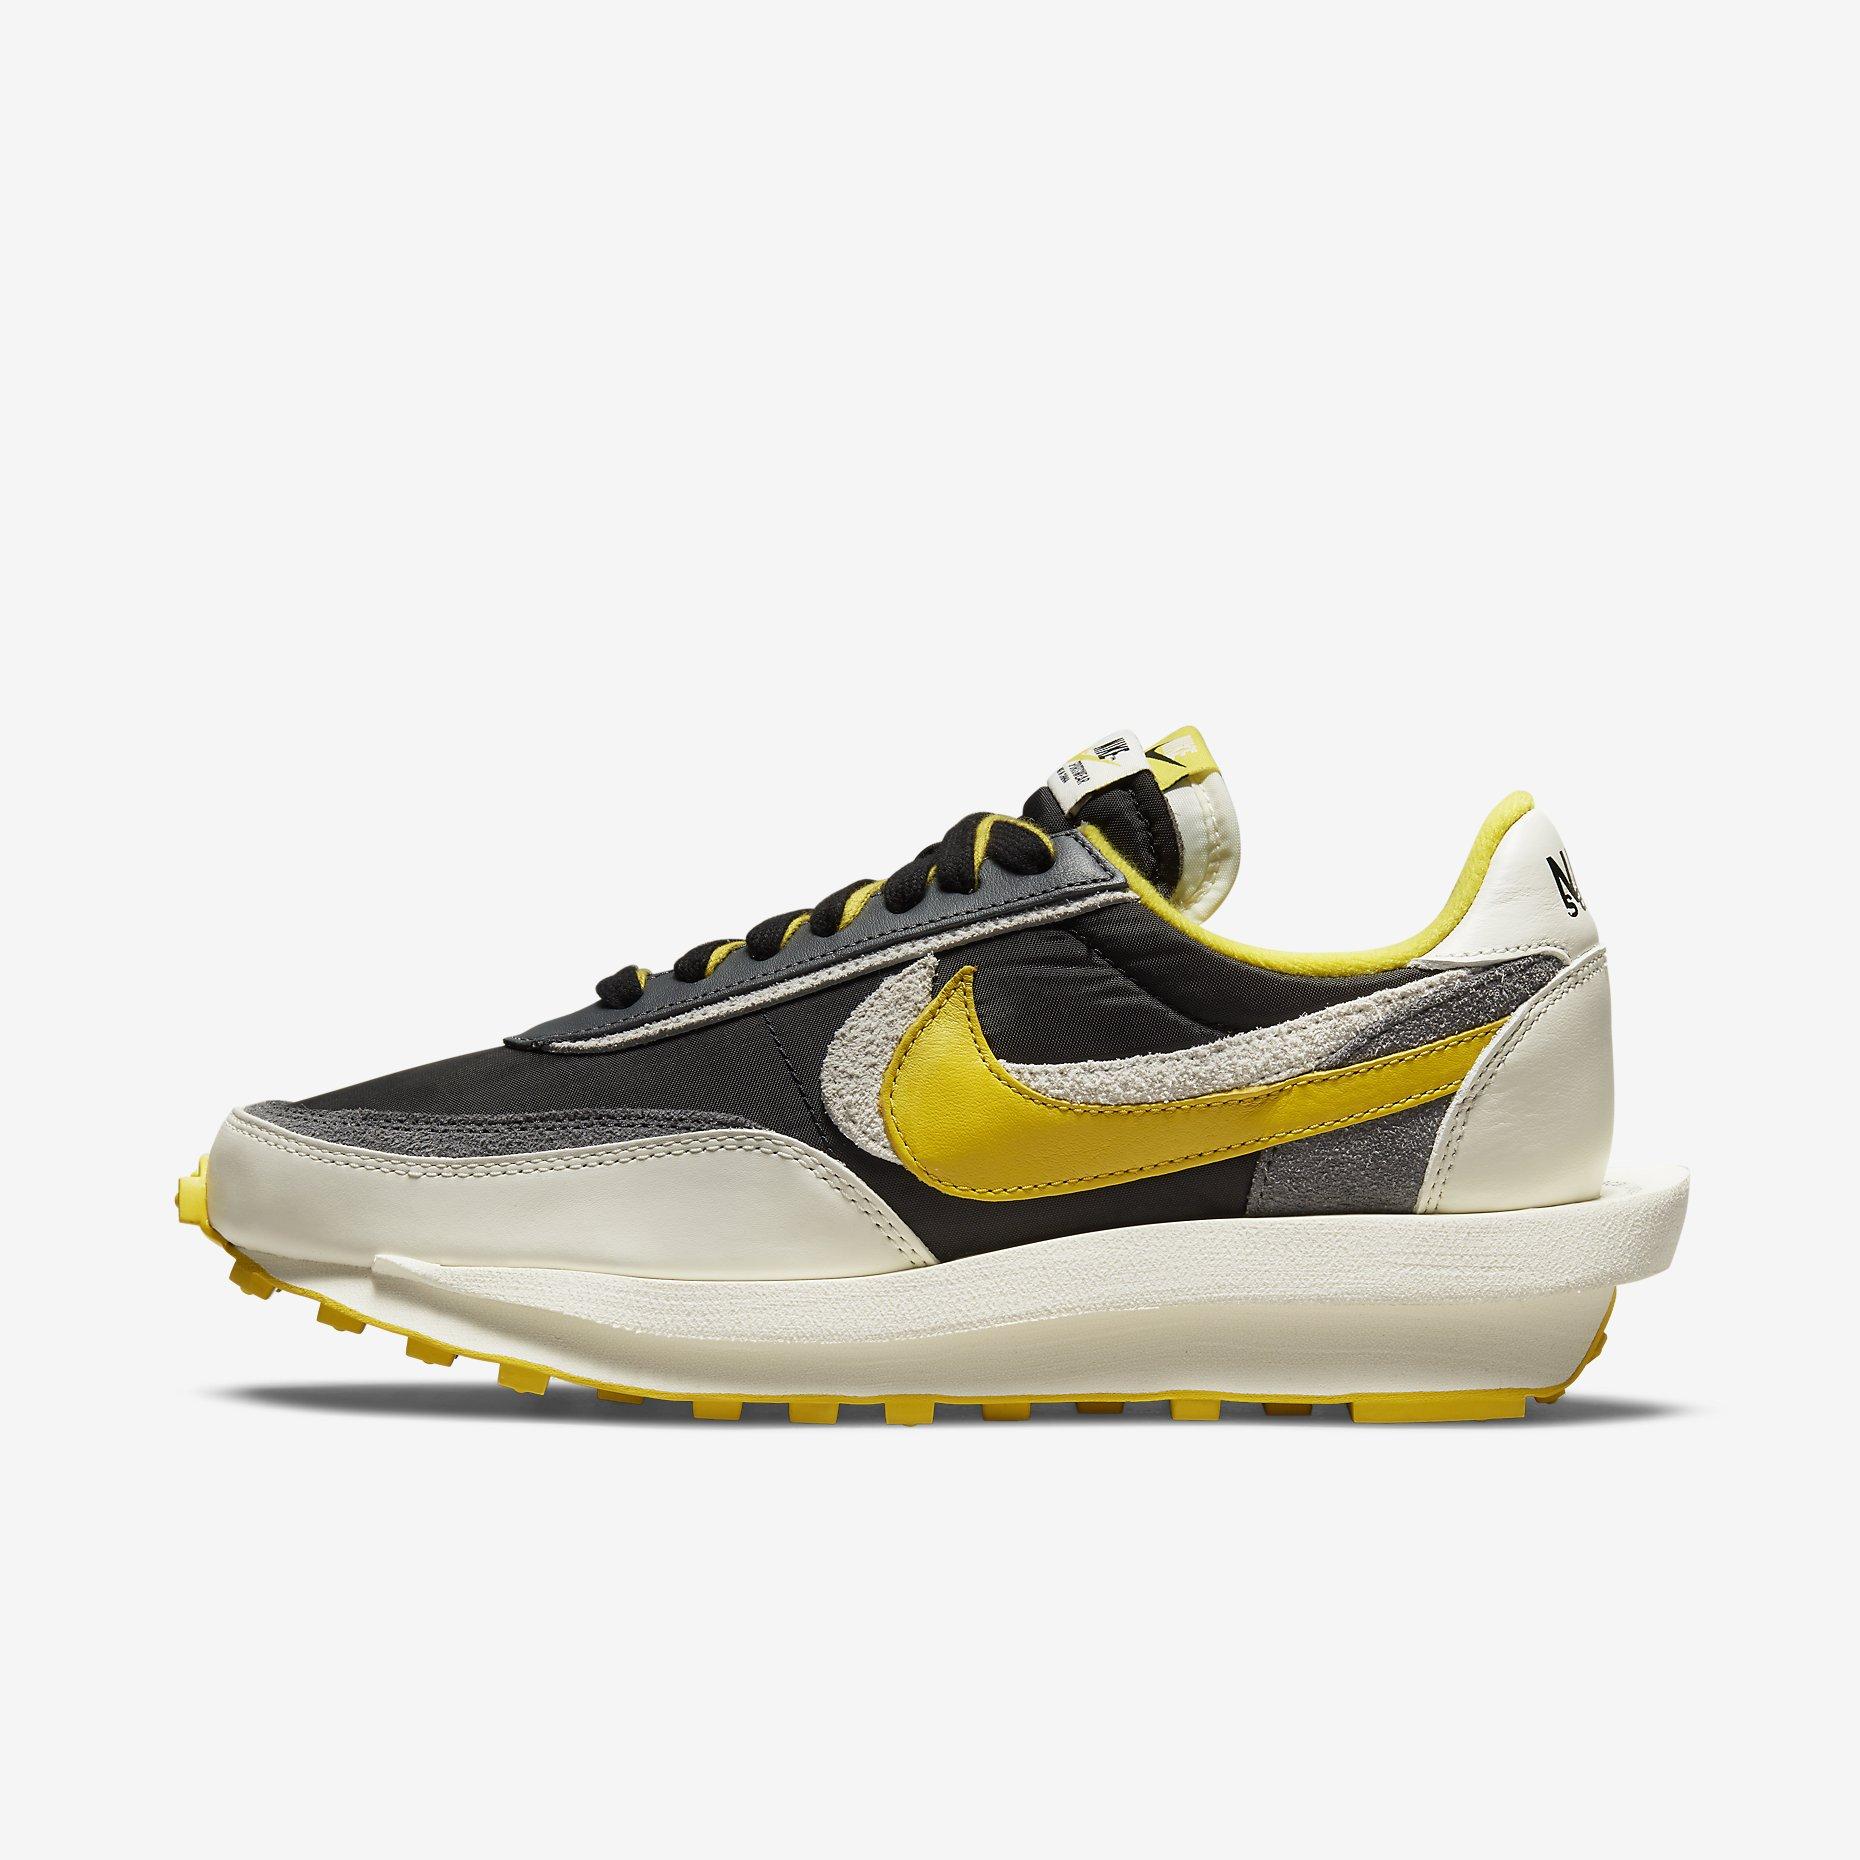 Undercover x Sacai x Nike LDWaffle 'Black Bright Citron'